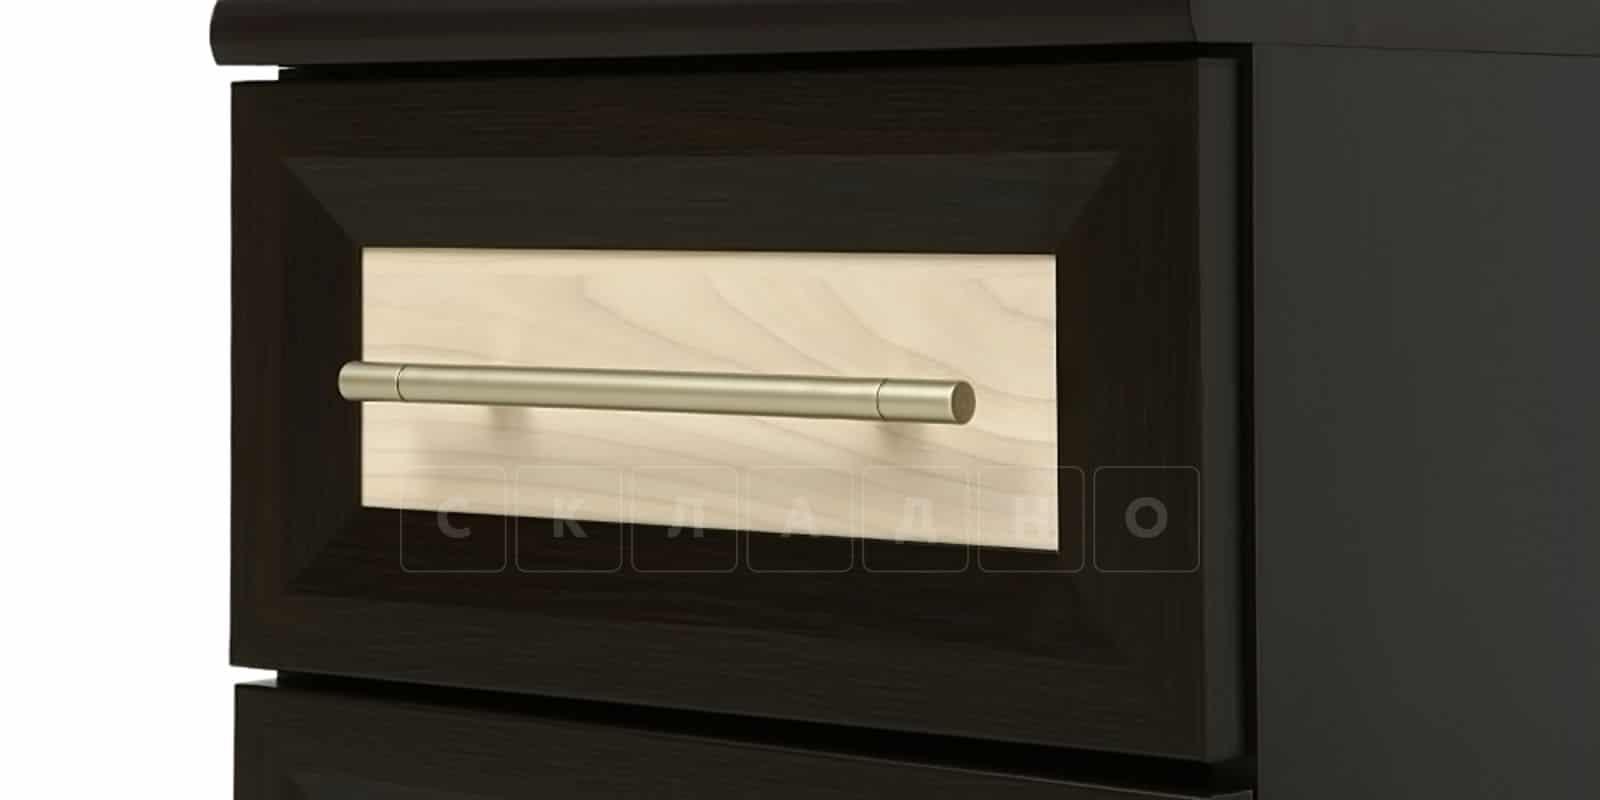 Прикроватная тумба Юлианна фото 3 | интернет-магазин Складно